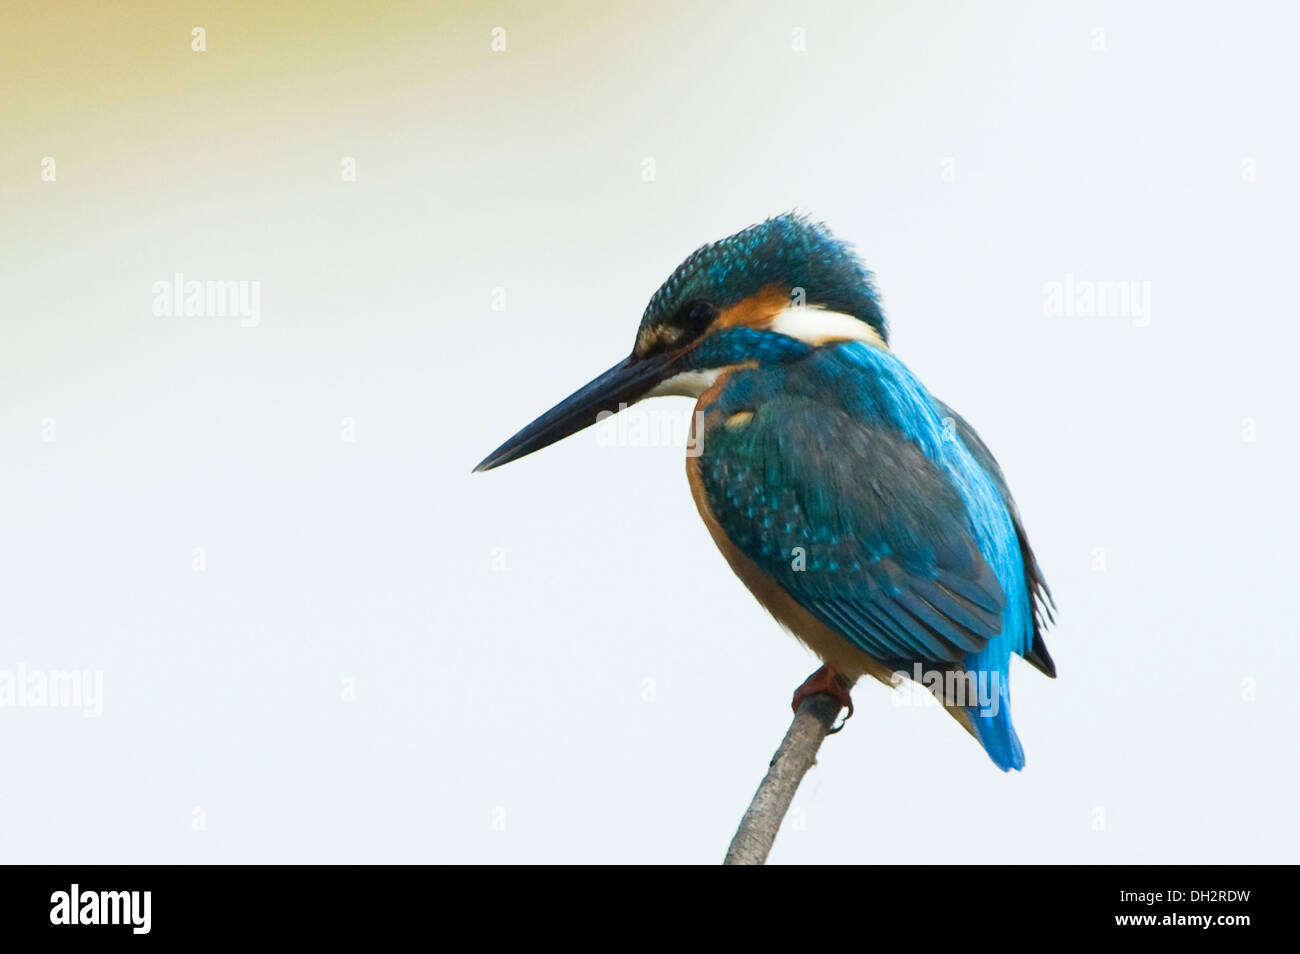 Kingfisher bird Keoladeo Ghana bird sanctuary Bharatpur Rajasthan India Asia - Stock Image